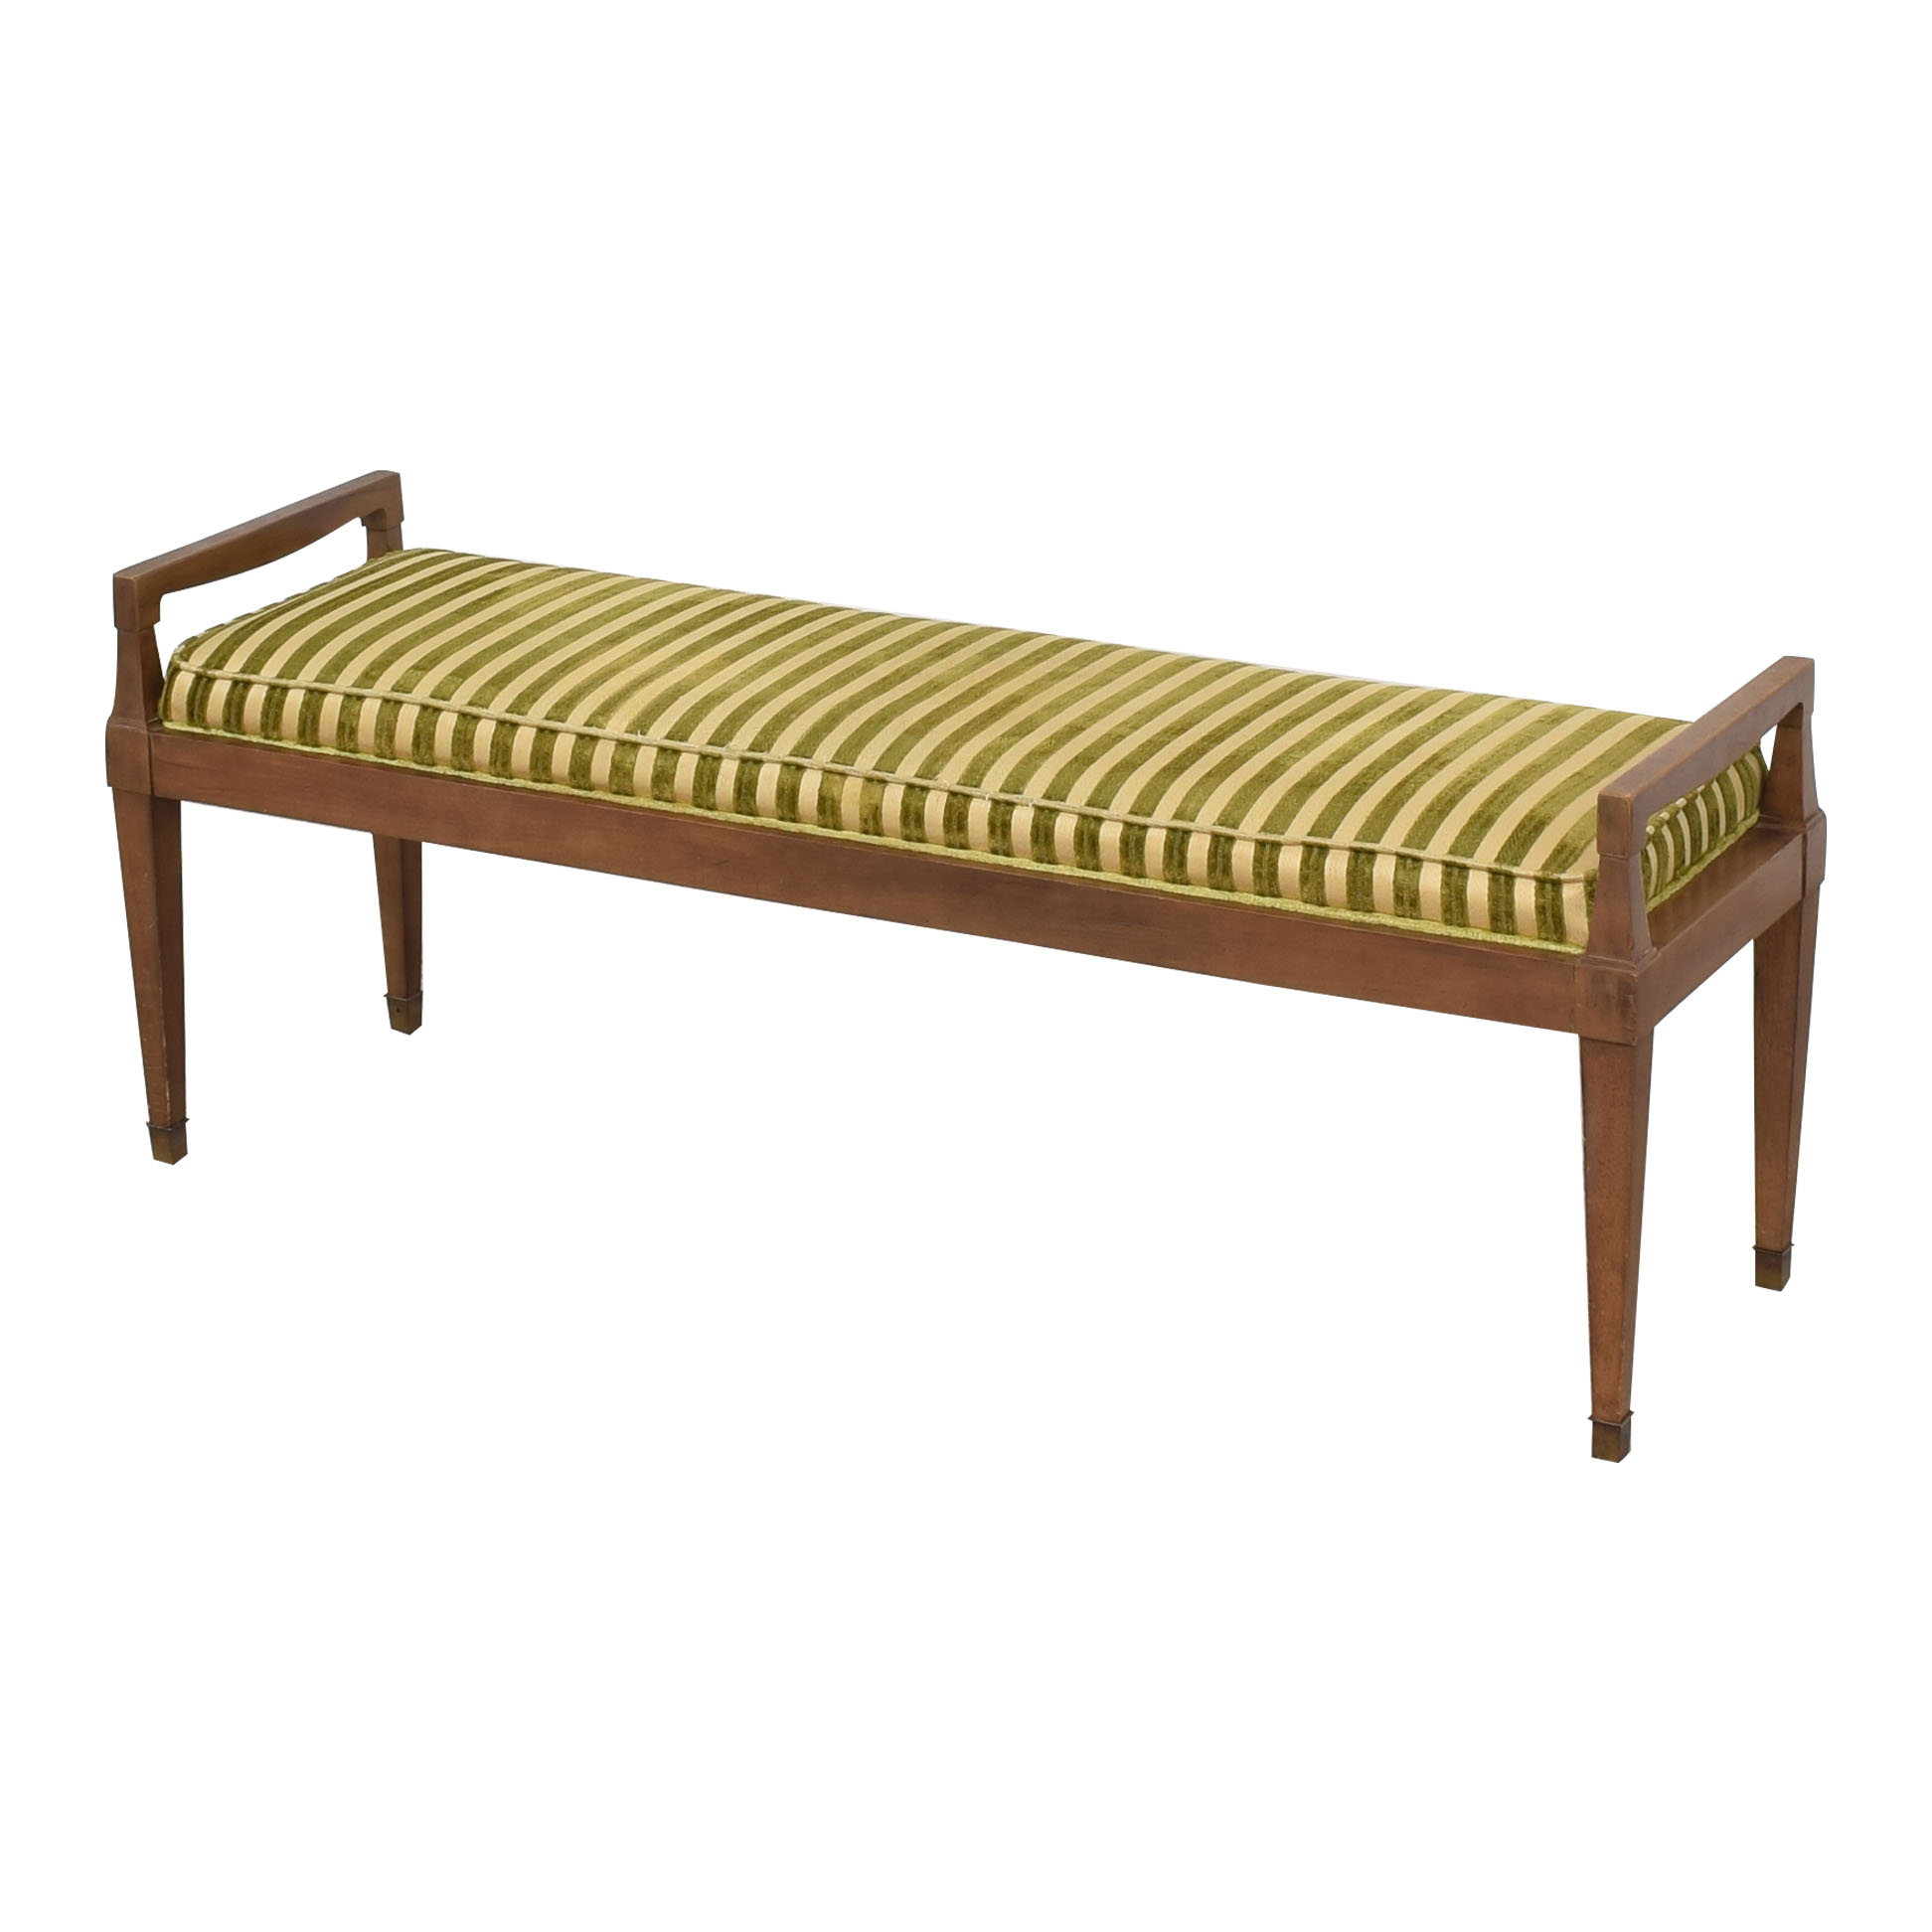 Drexel Vintage Drexel Cushioned Bench dimensions